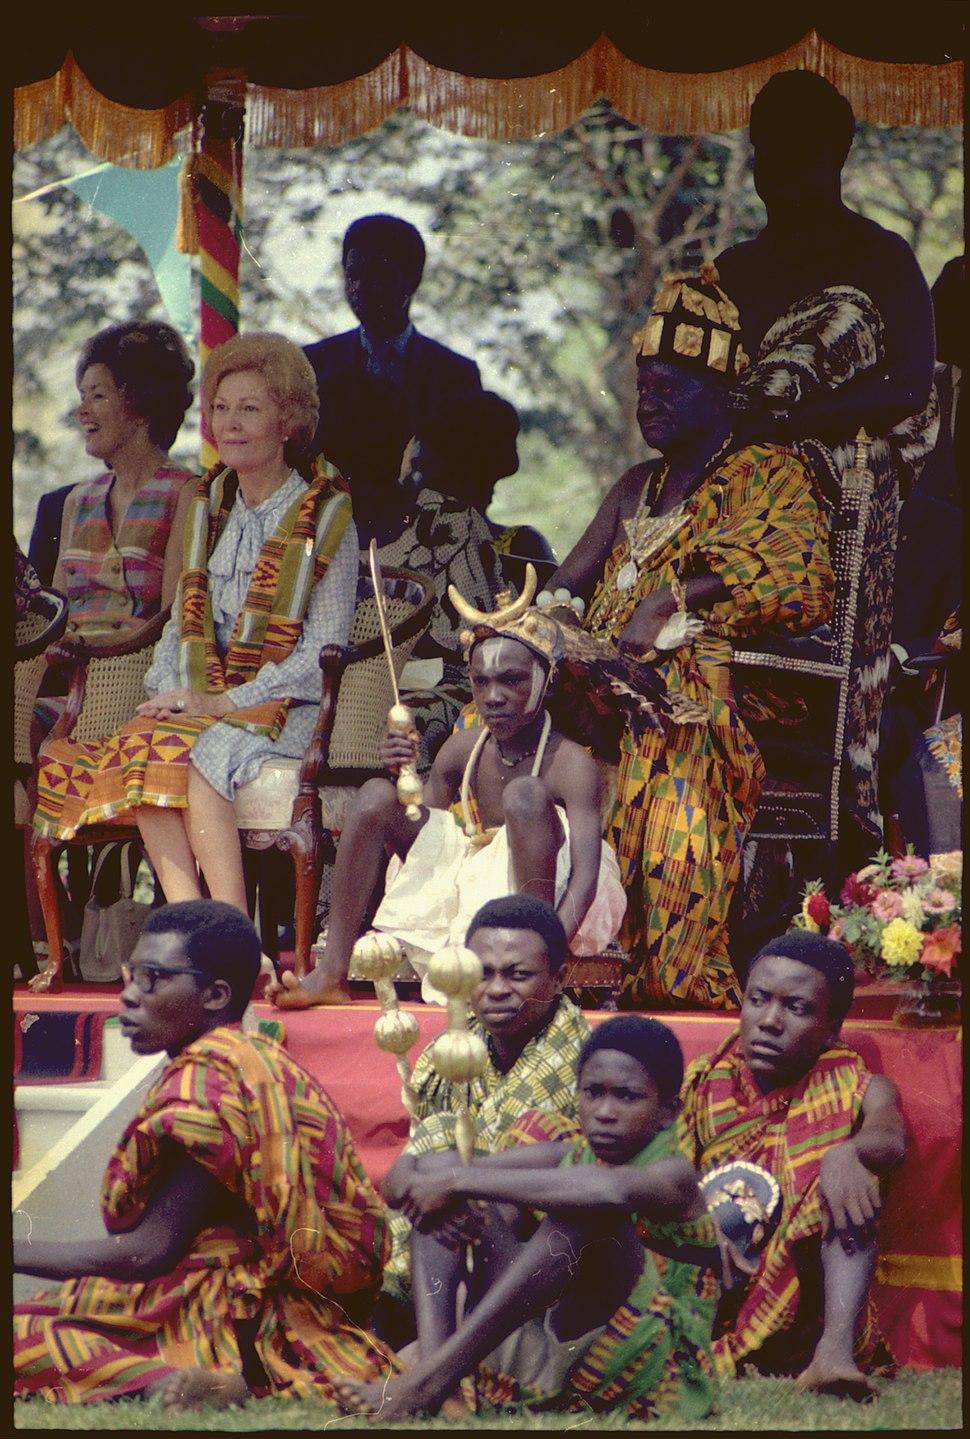 Mrs. Nixon attends a ceremony in Ghana - NARA - 194403